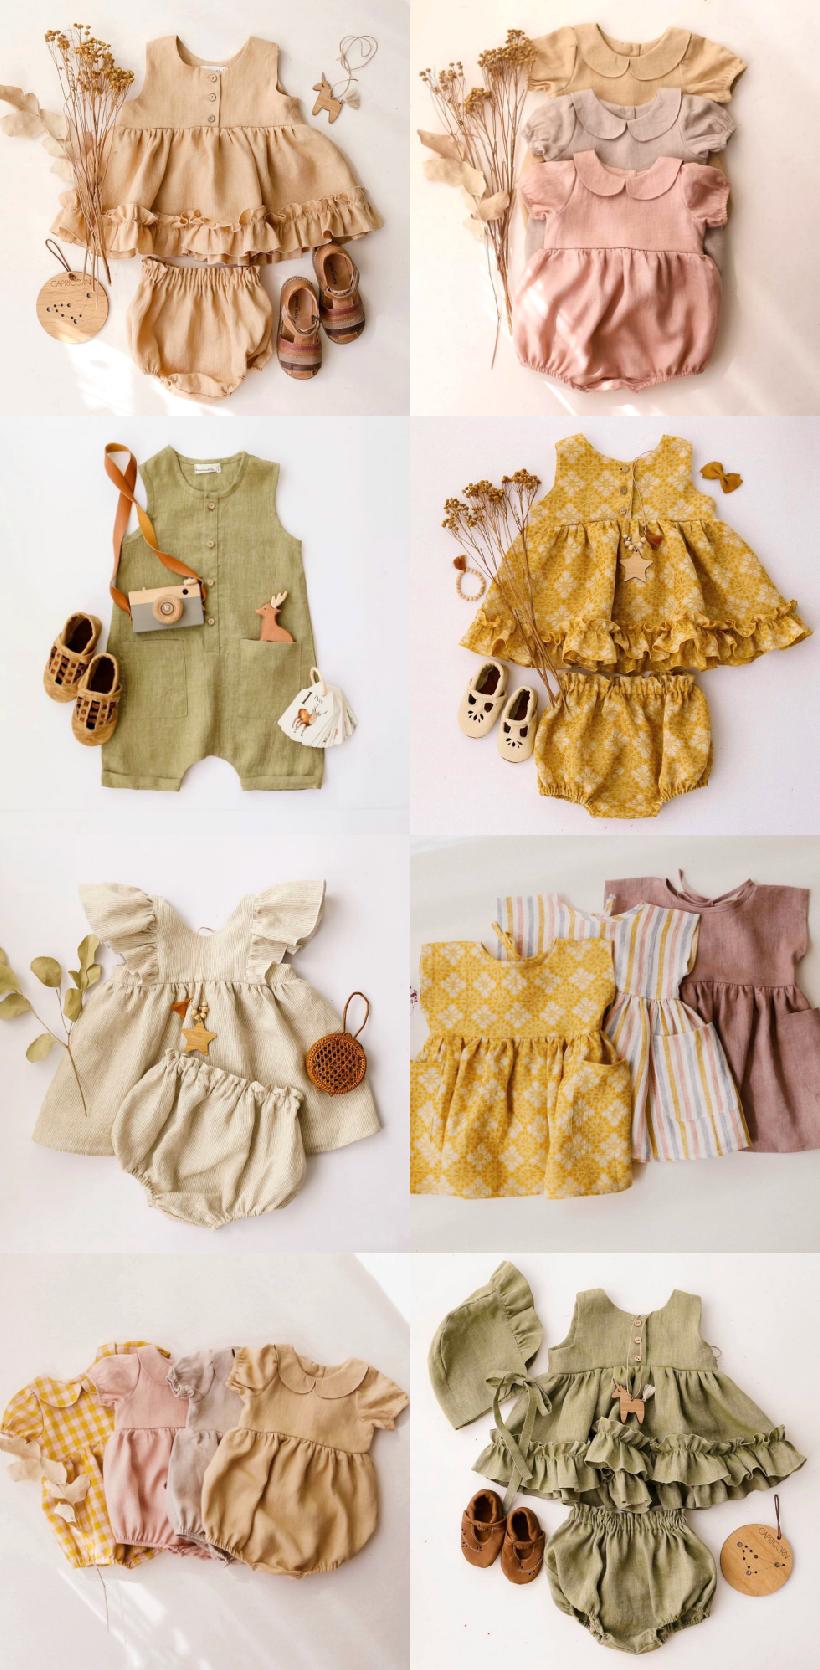 Handmade Linen Baby Kids Clothes Handmade Linen Romper Baby Dress Bloomers Unisex